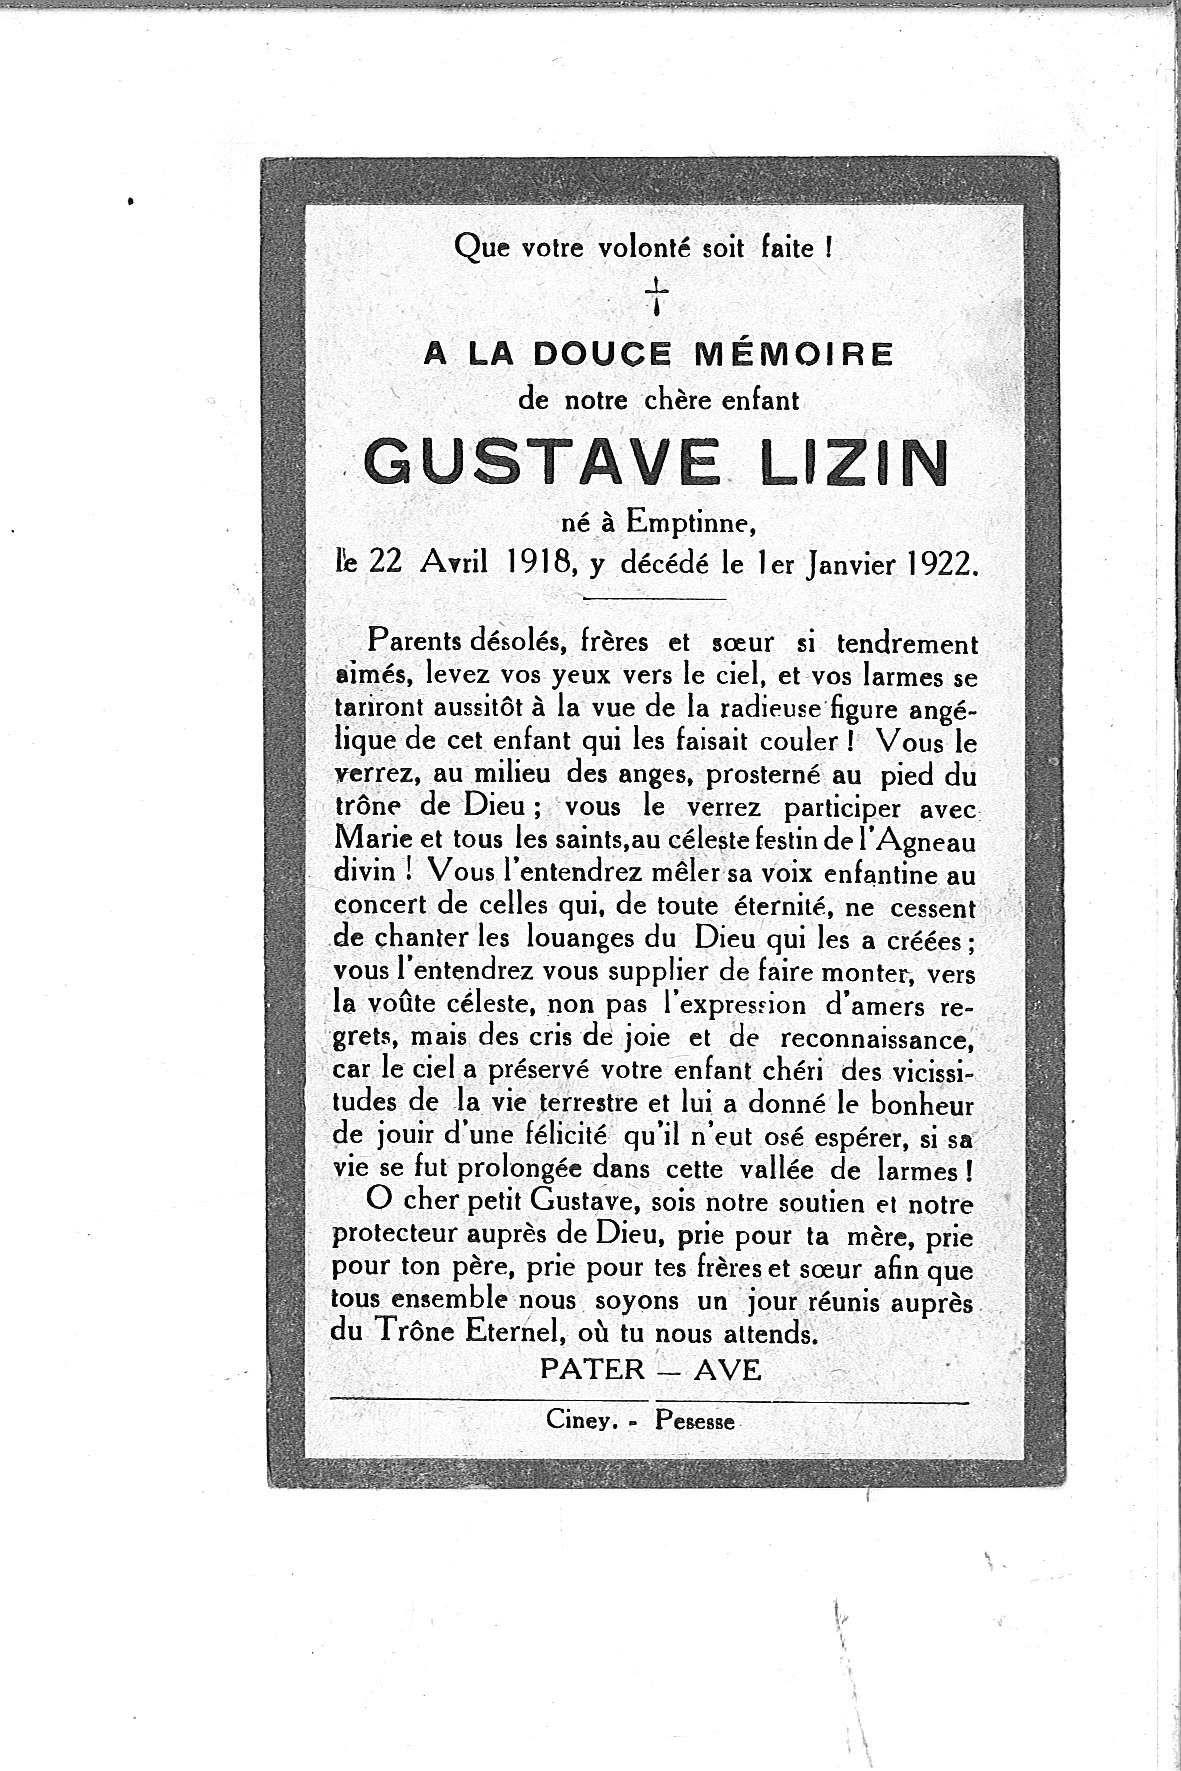 Gustave(1922)20131203145956_00012.jpg